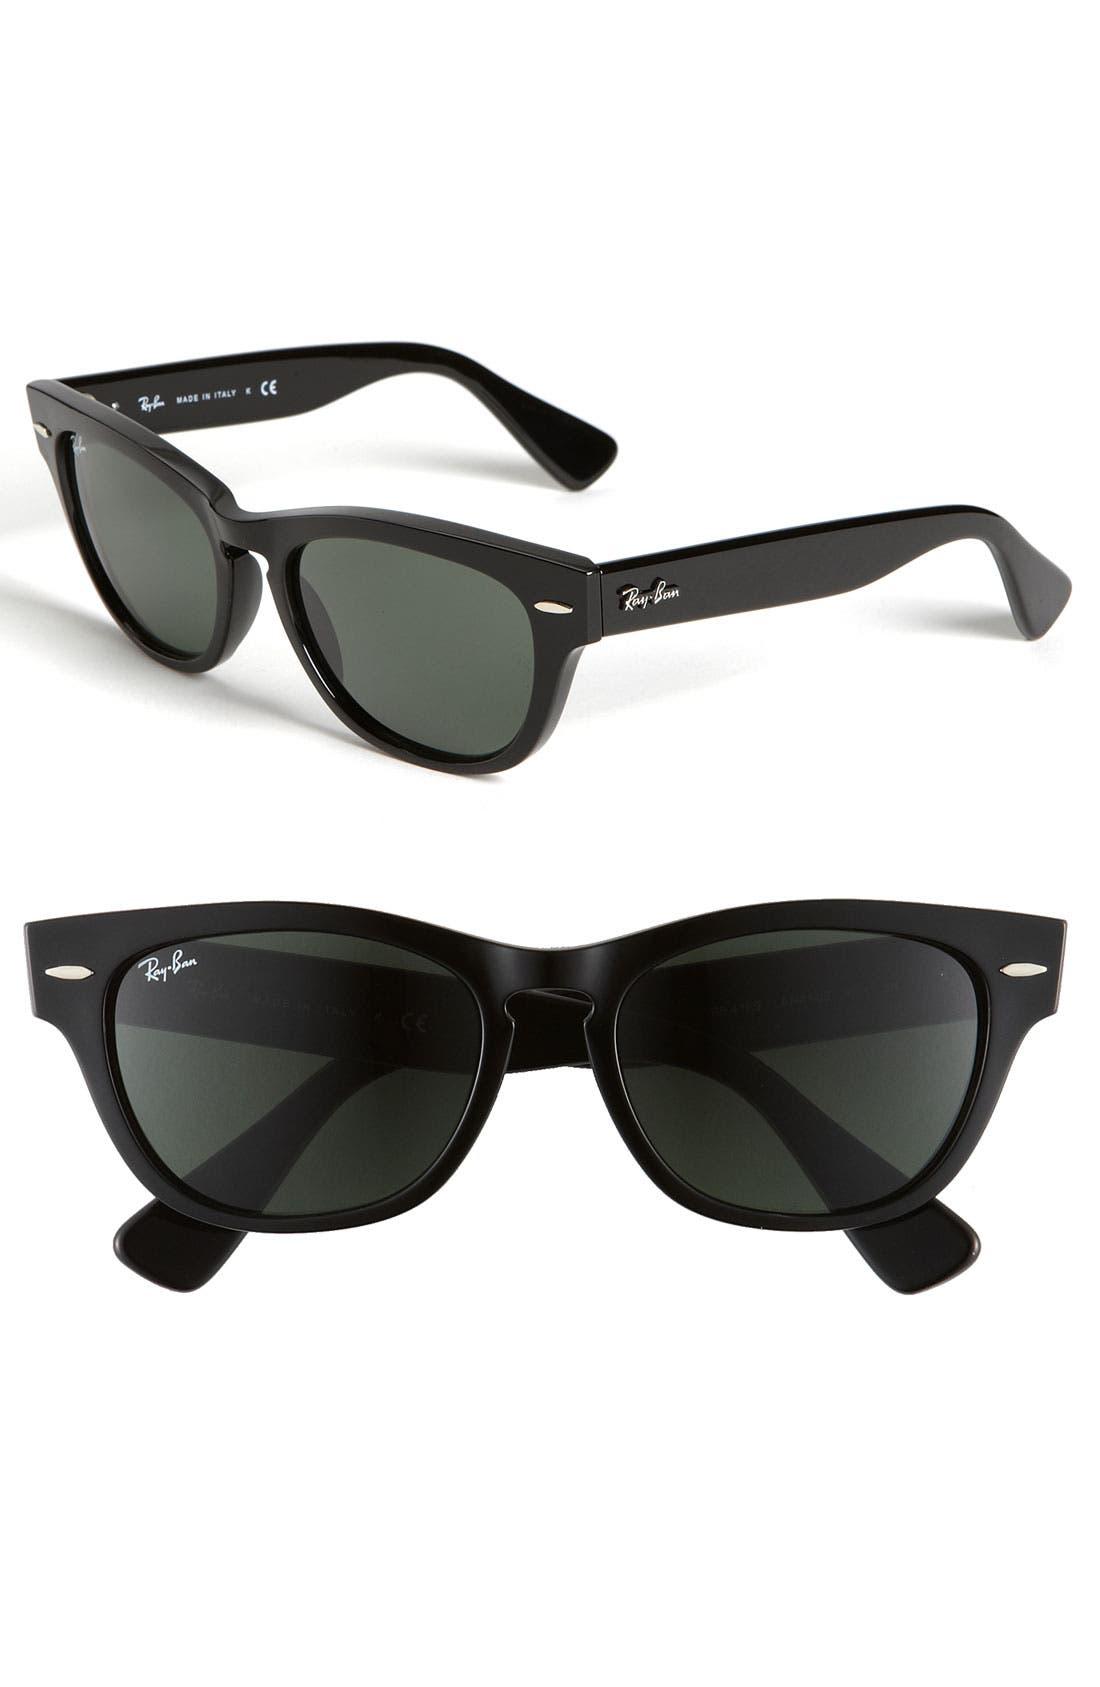 Alternate Image 1 Selected - Ray-Ban 'Legend Collection Wayfarer' Sunglasses